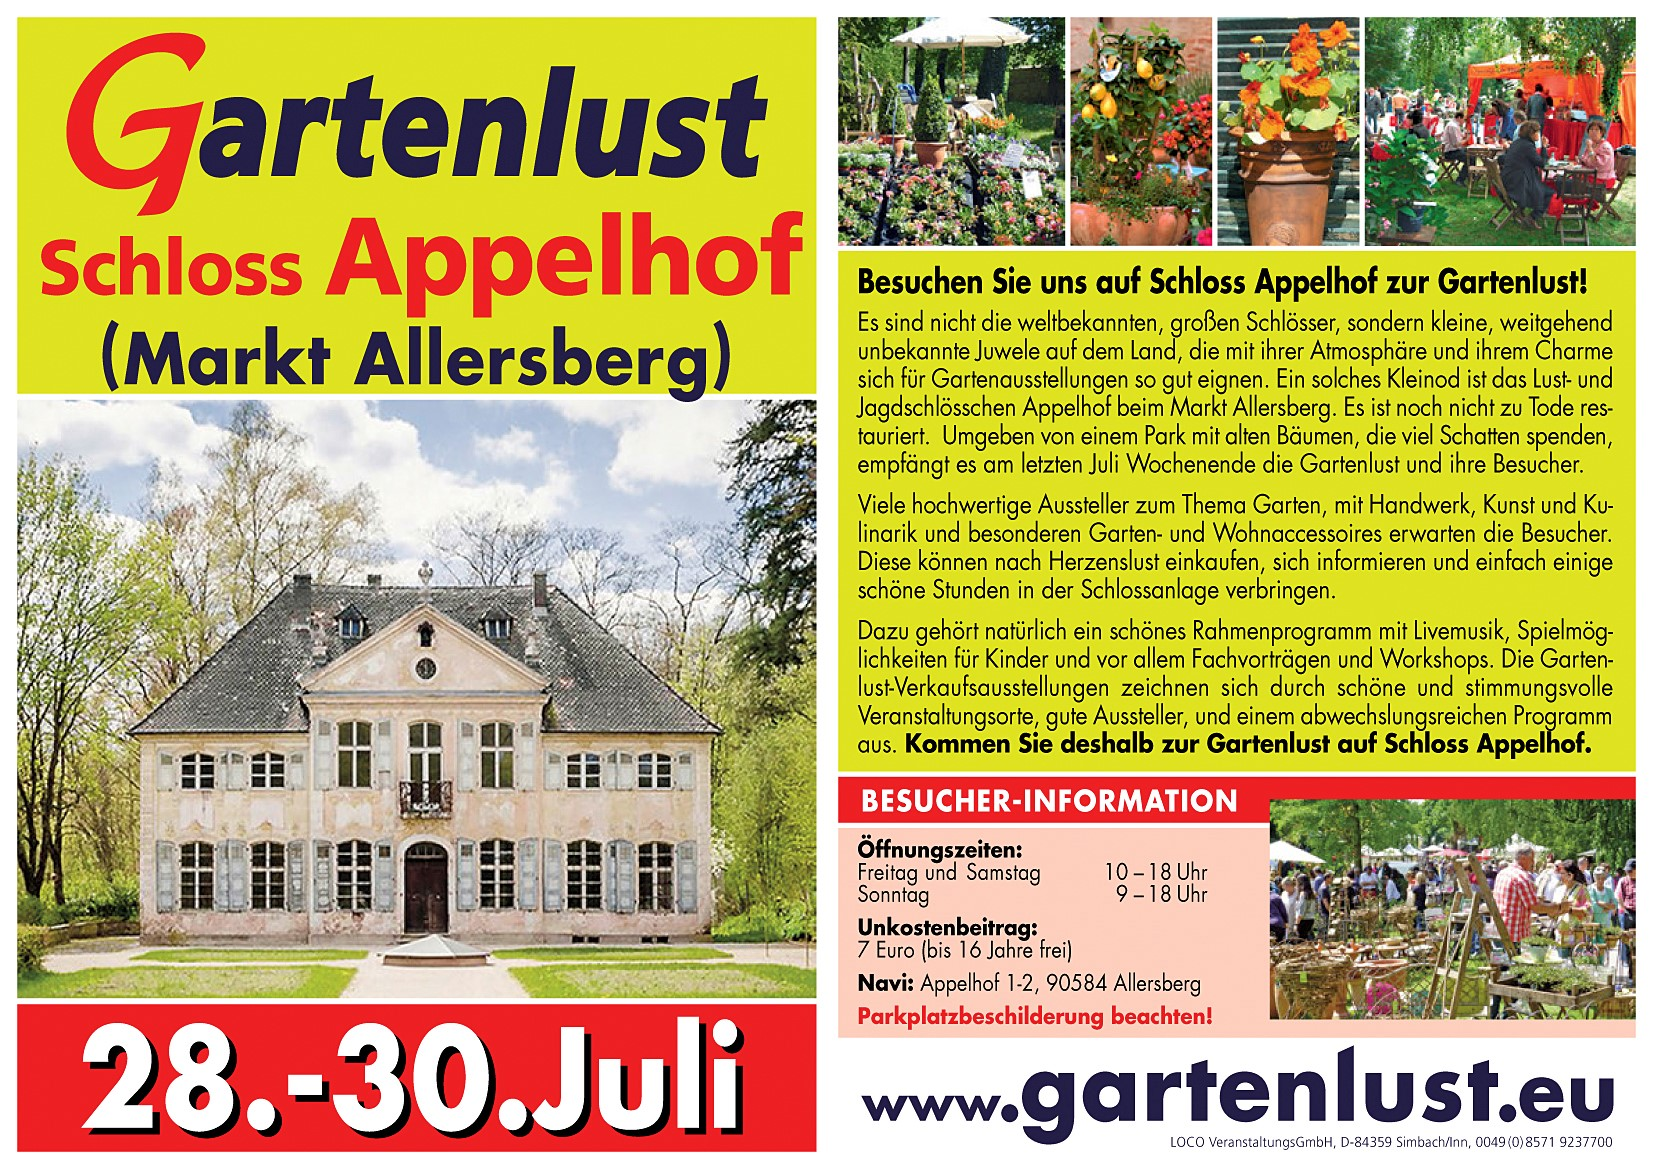 Gartenlust Appelhof